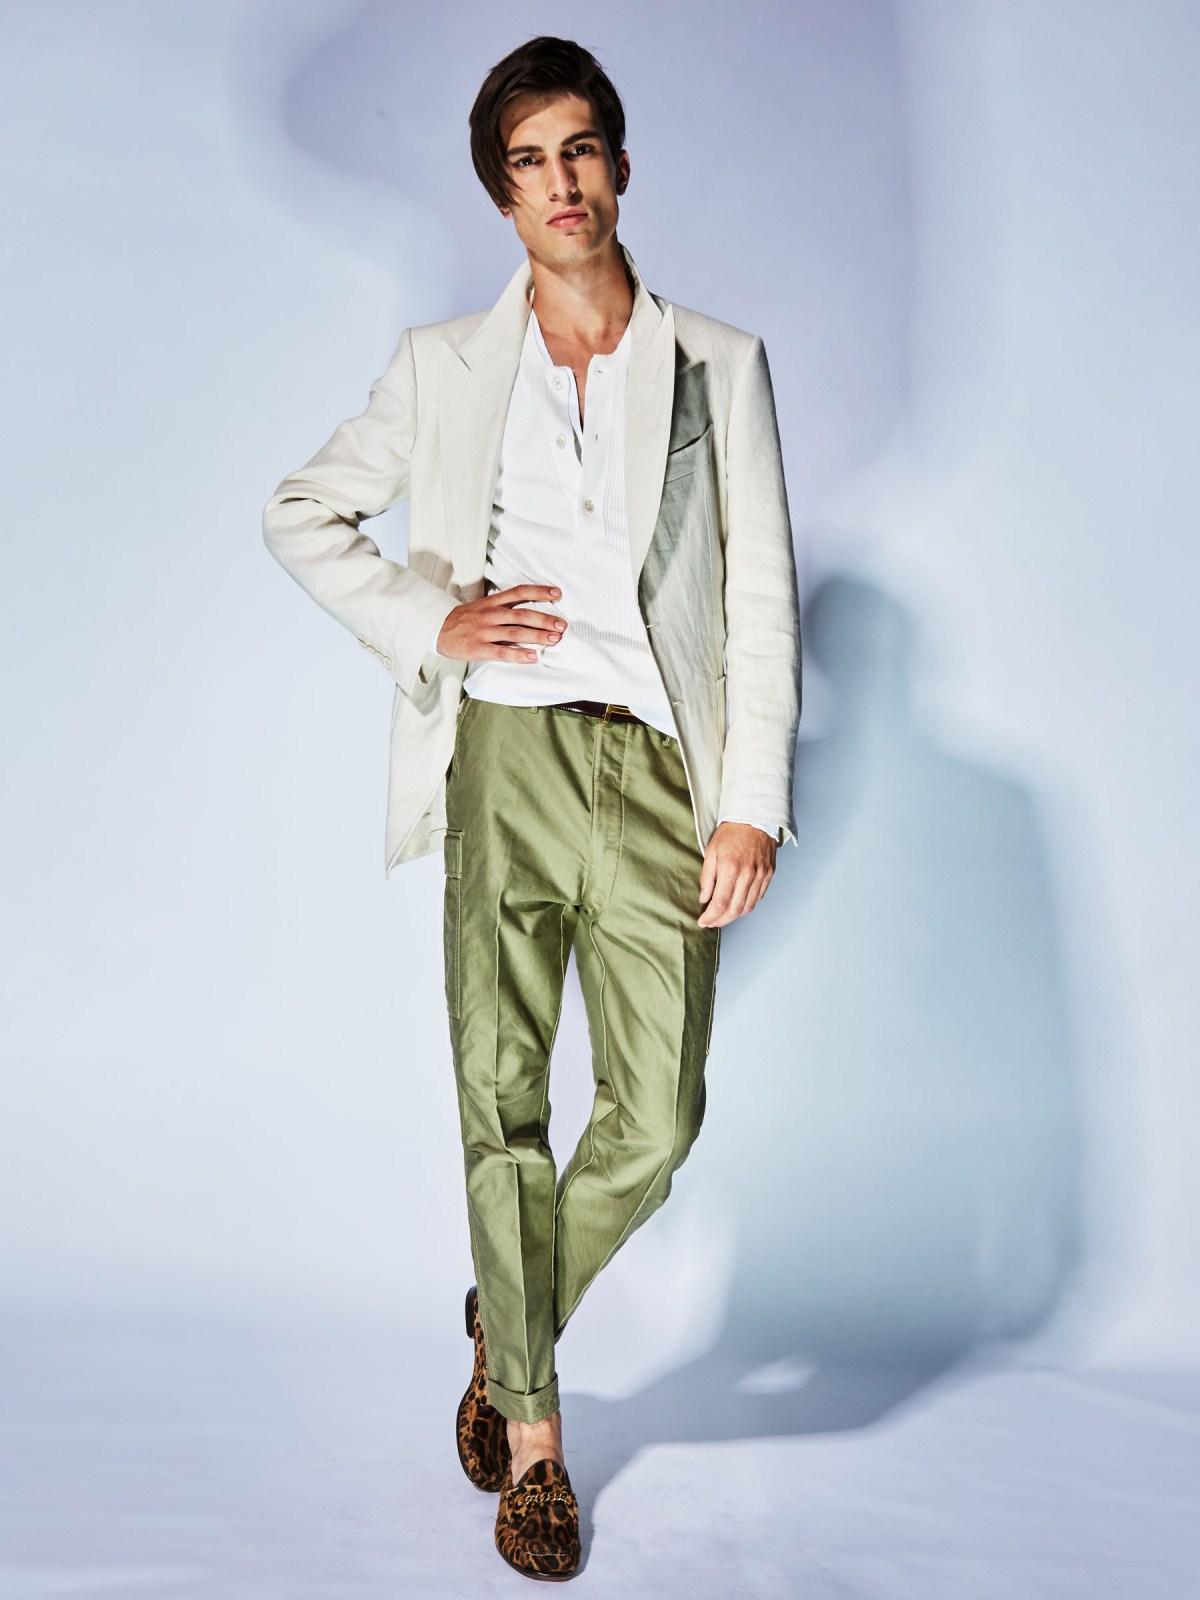 Men's Fashion Trends For 2018 FashionBeans 65